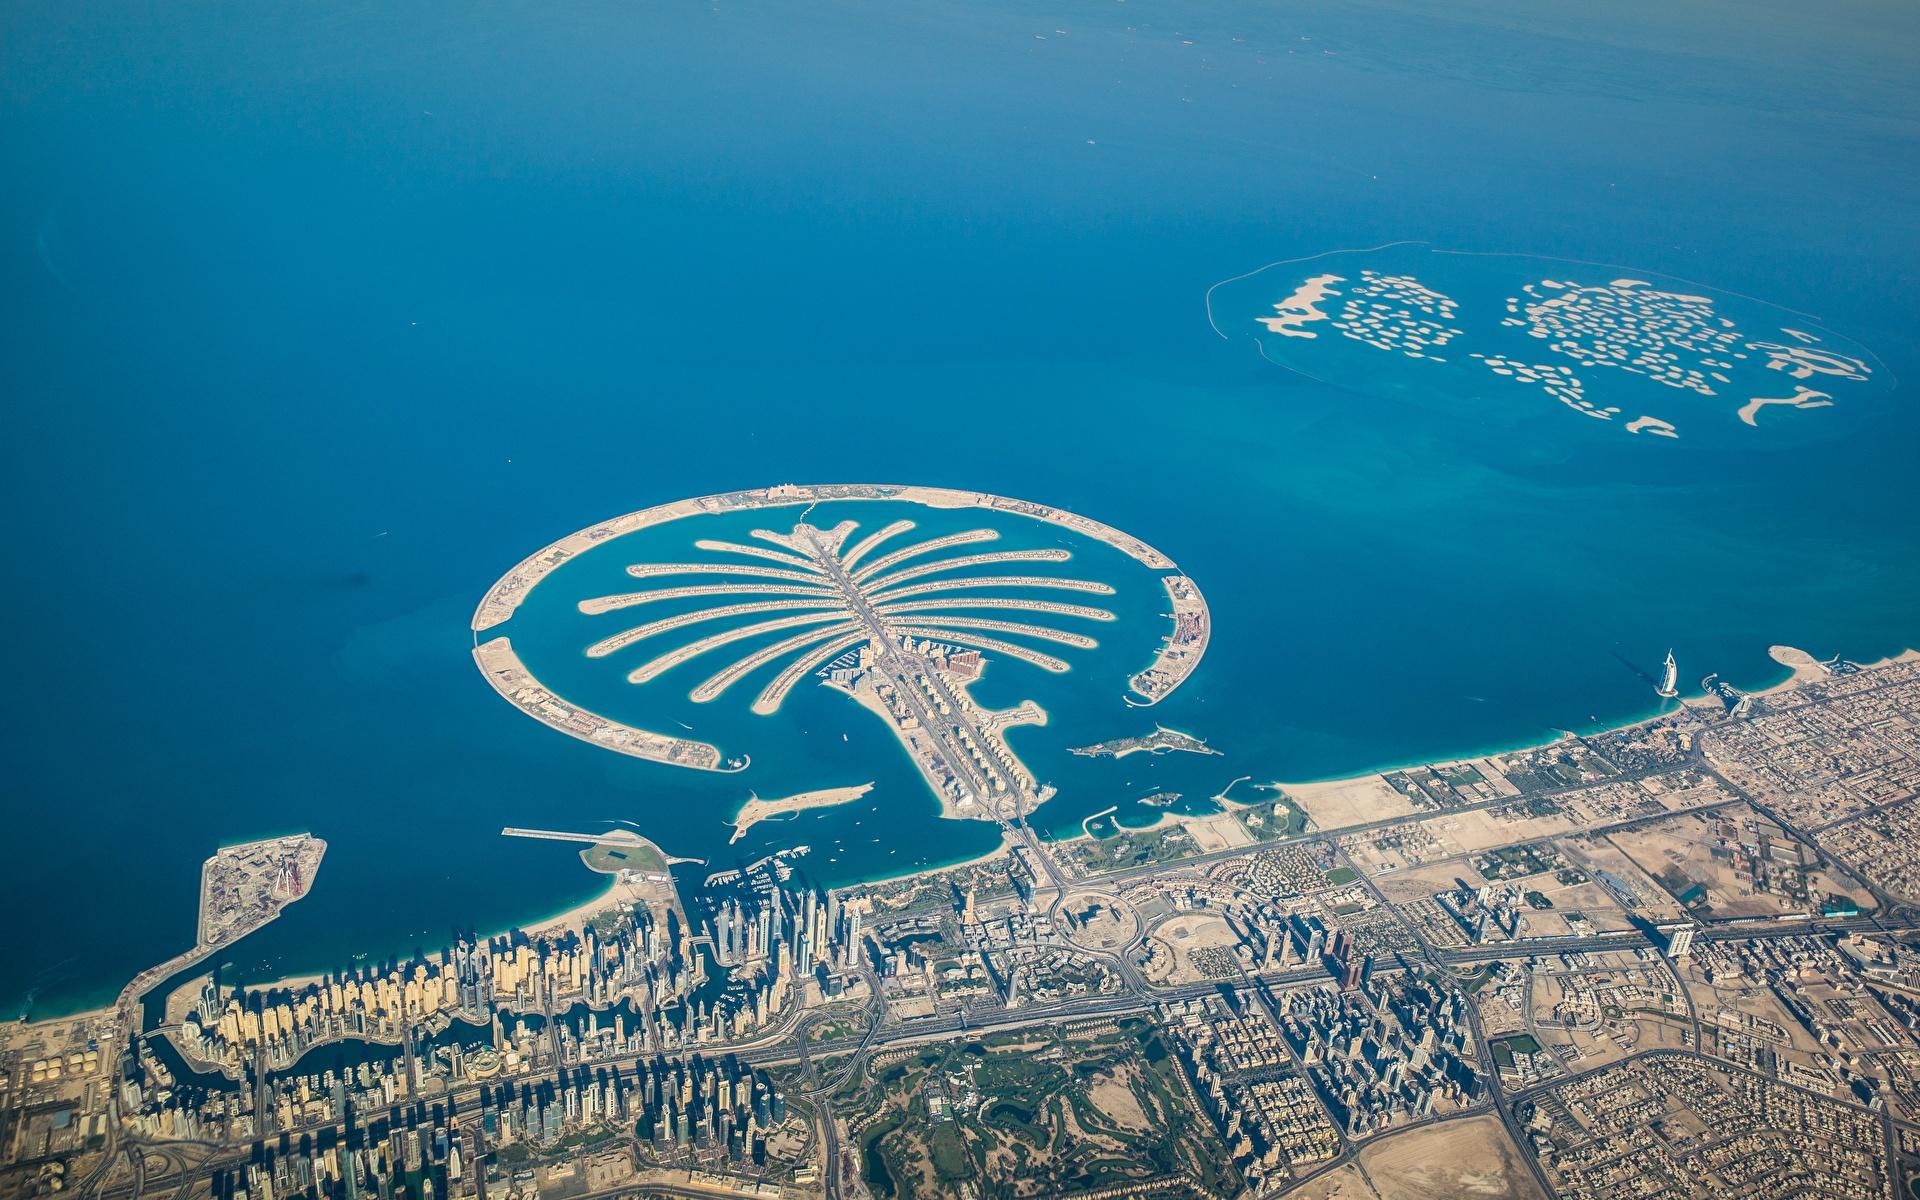 Photo Dubai Palm Jumeirah Island From above Cities 1920x1200